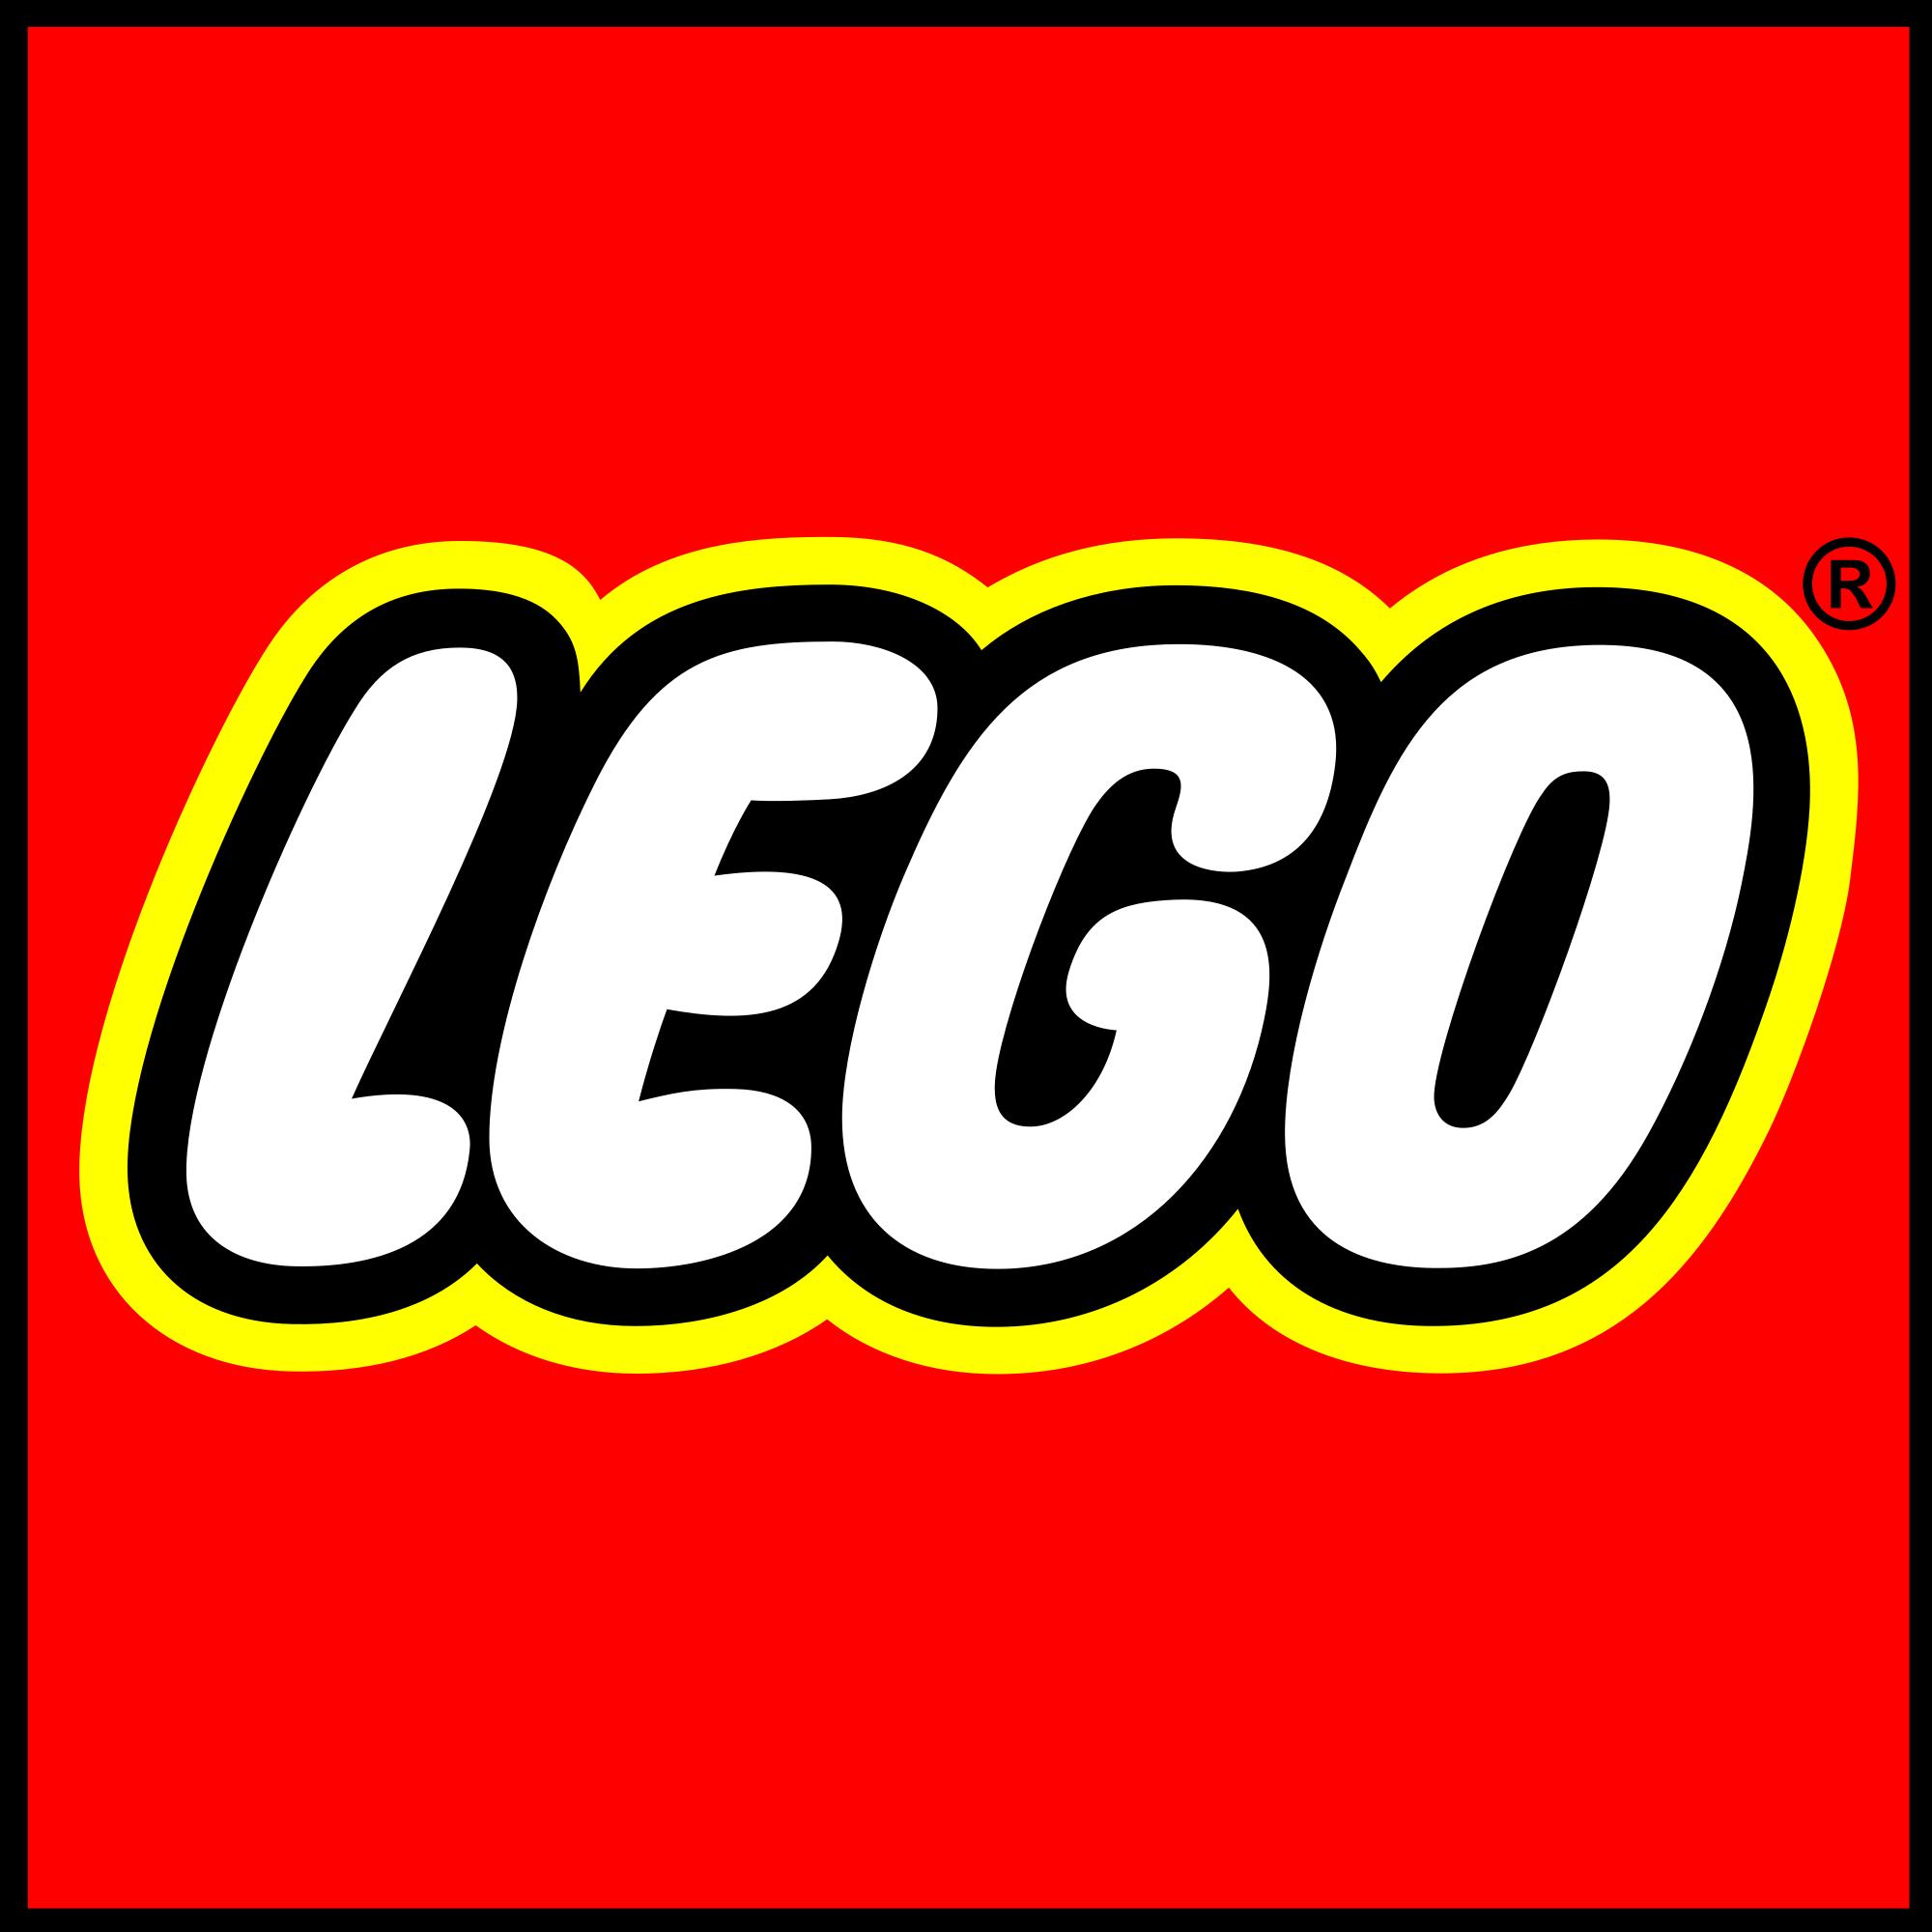 Compro Lego